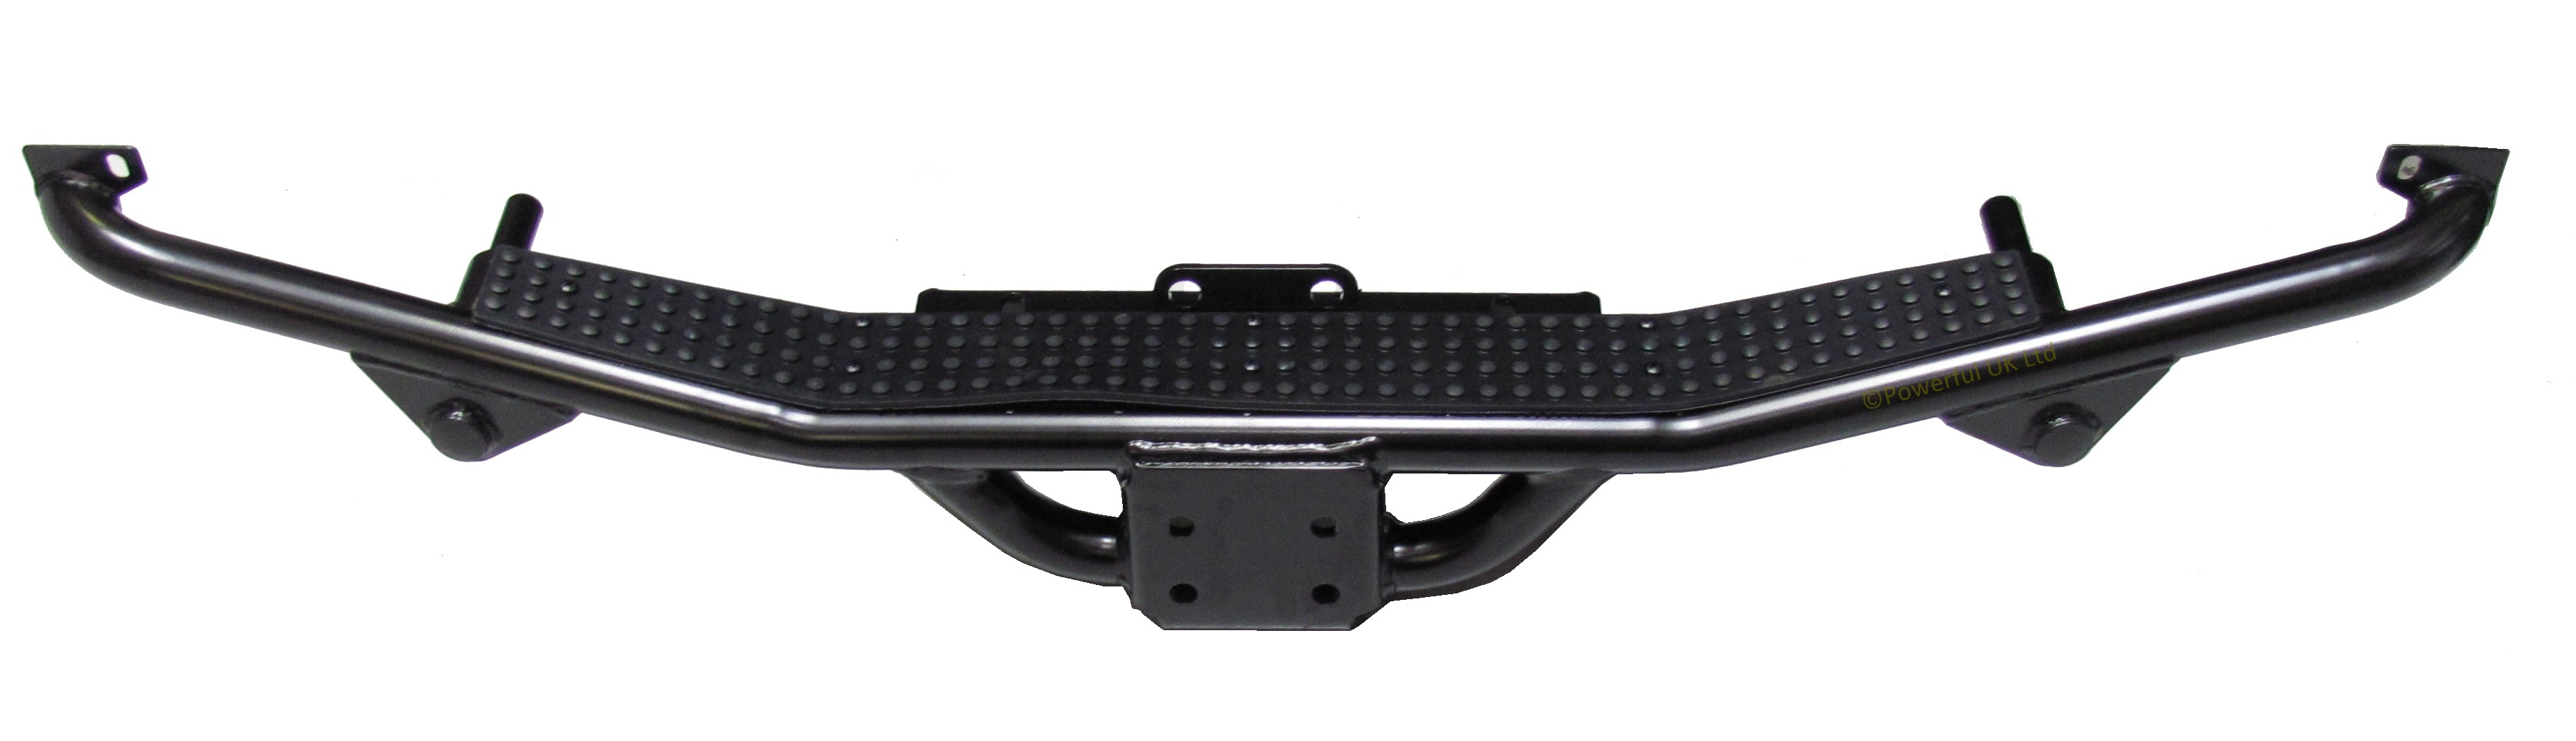 Rear Tow Bar Step Bumper For Land Rover Defender 90 Svx